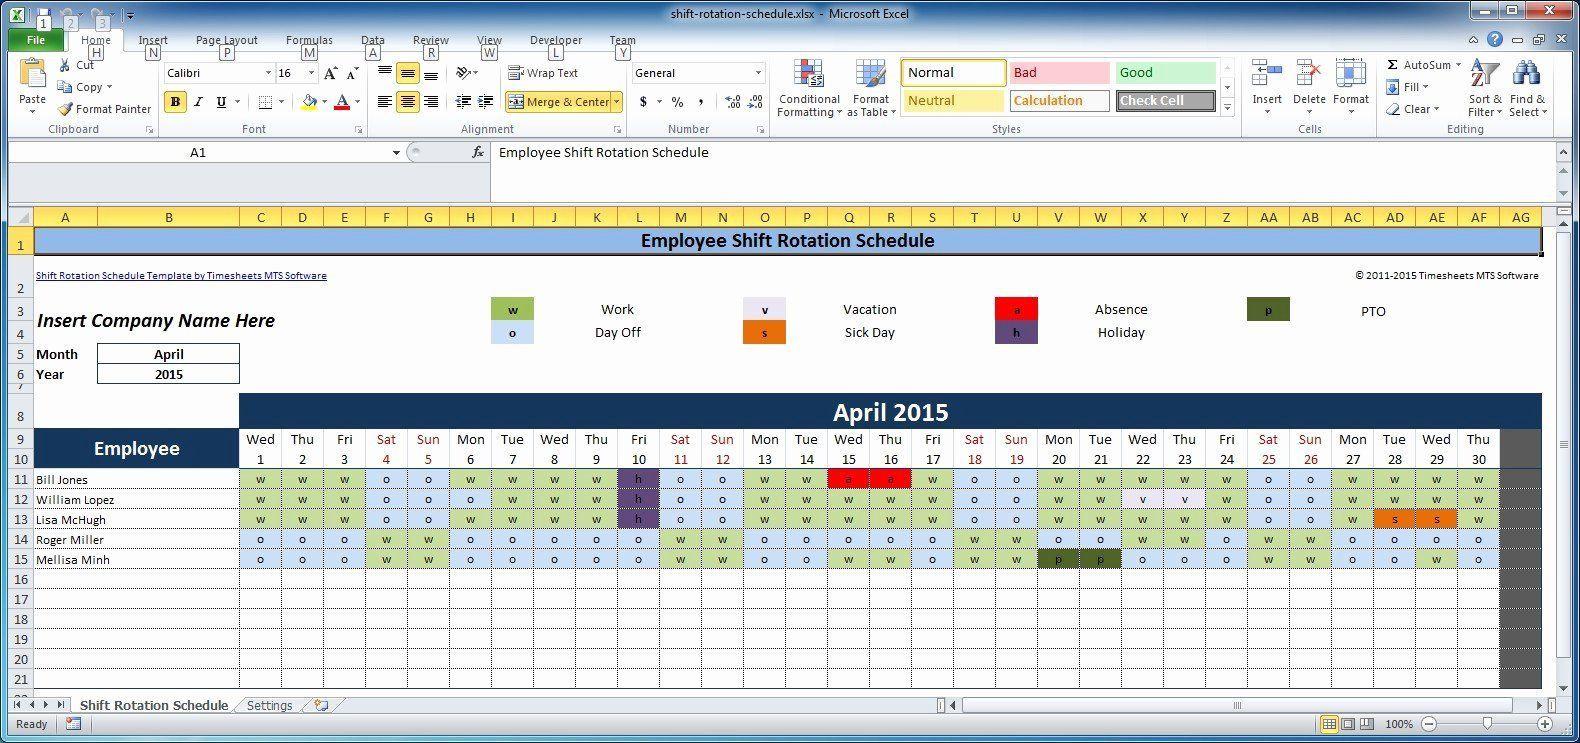 003 Fantastic Google Doc Employee Schedule Template High Def  Weekly WorkFull